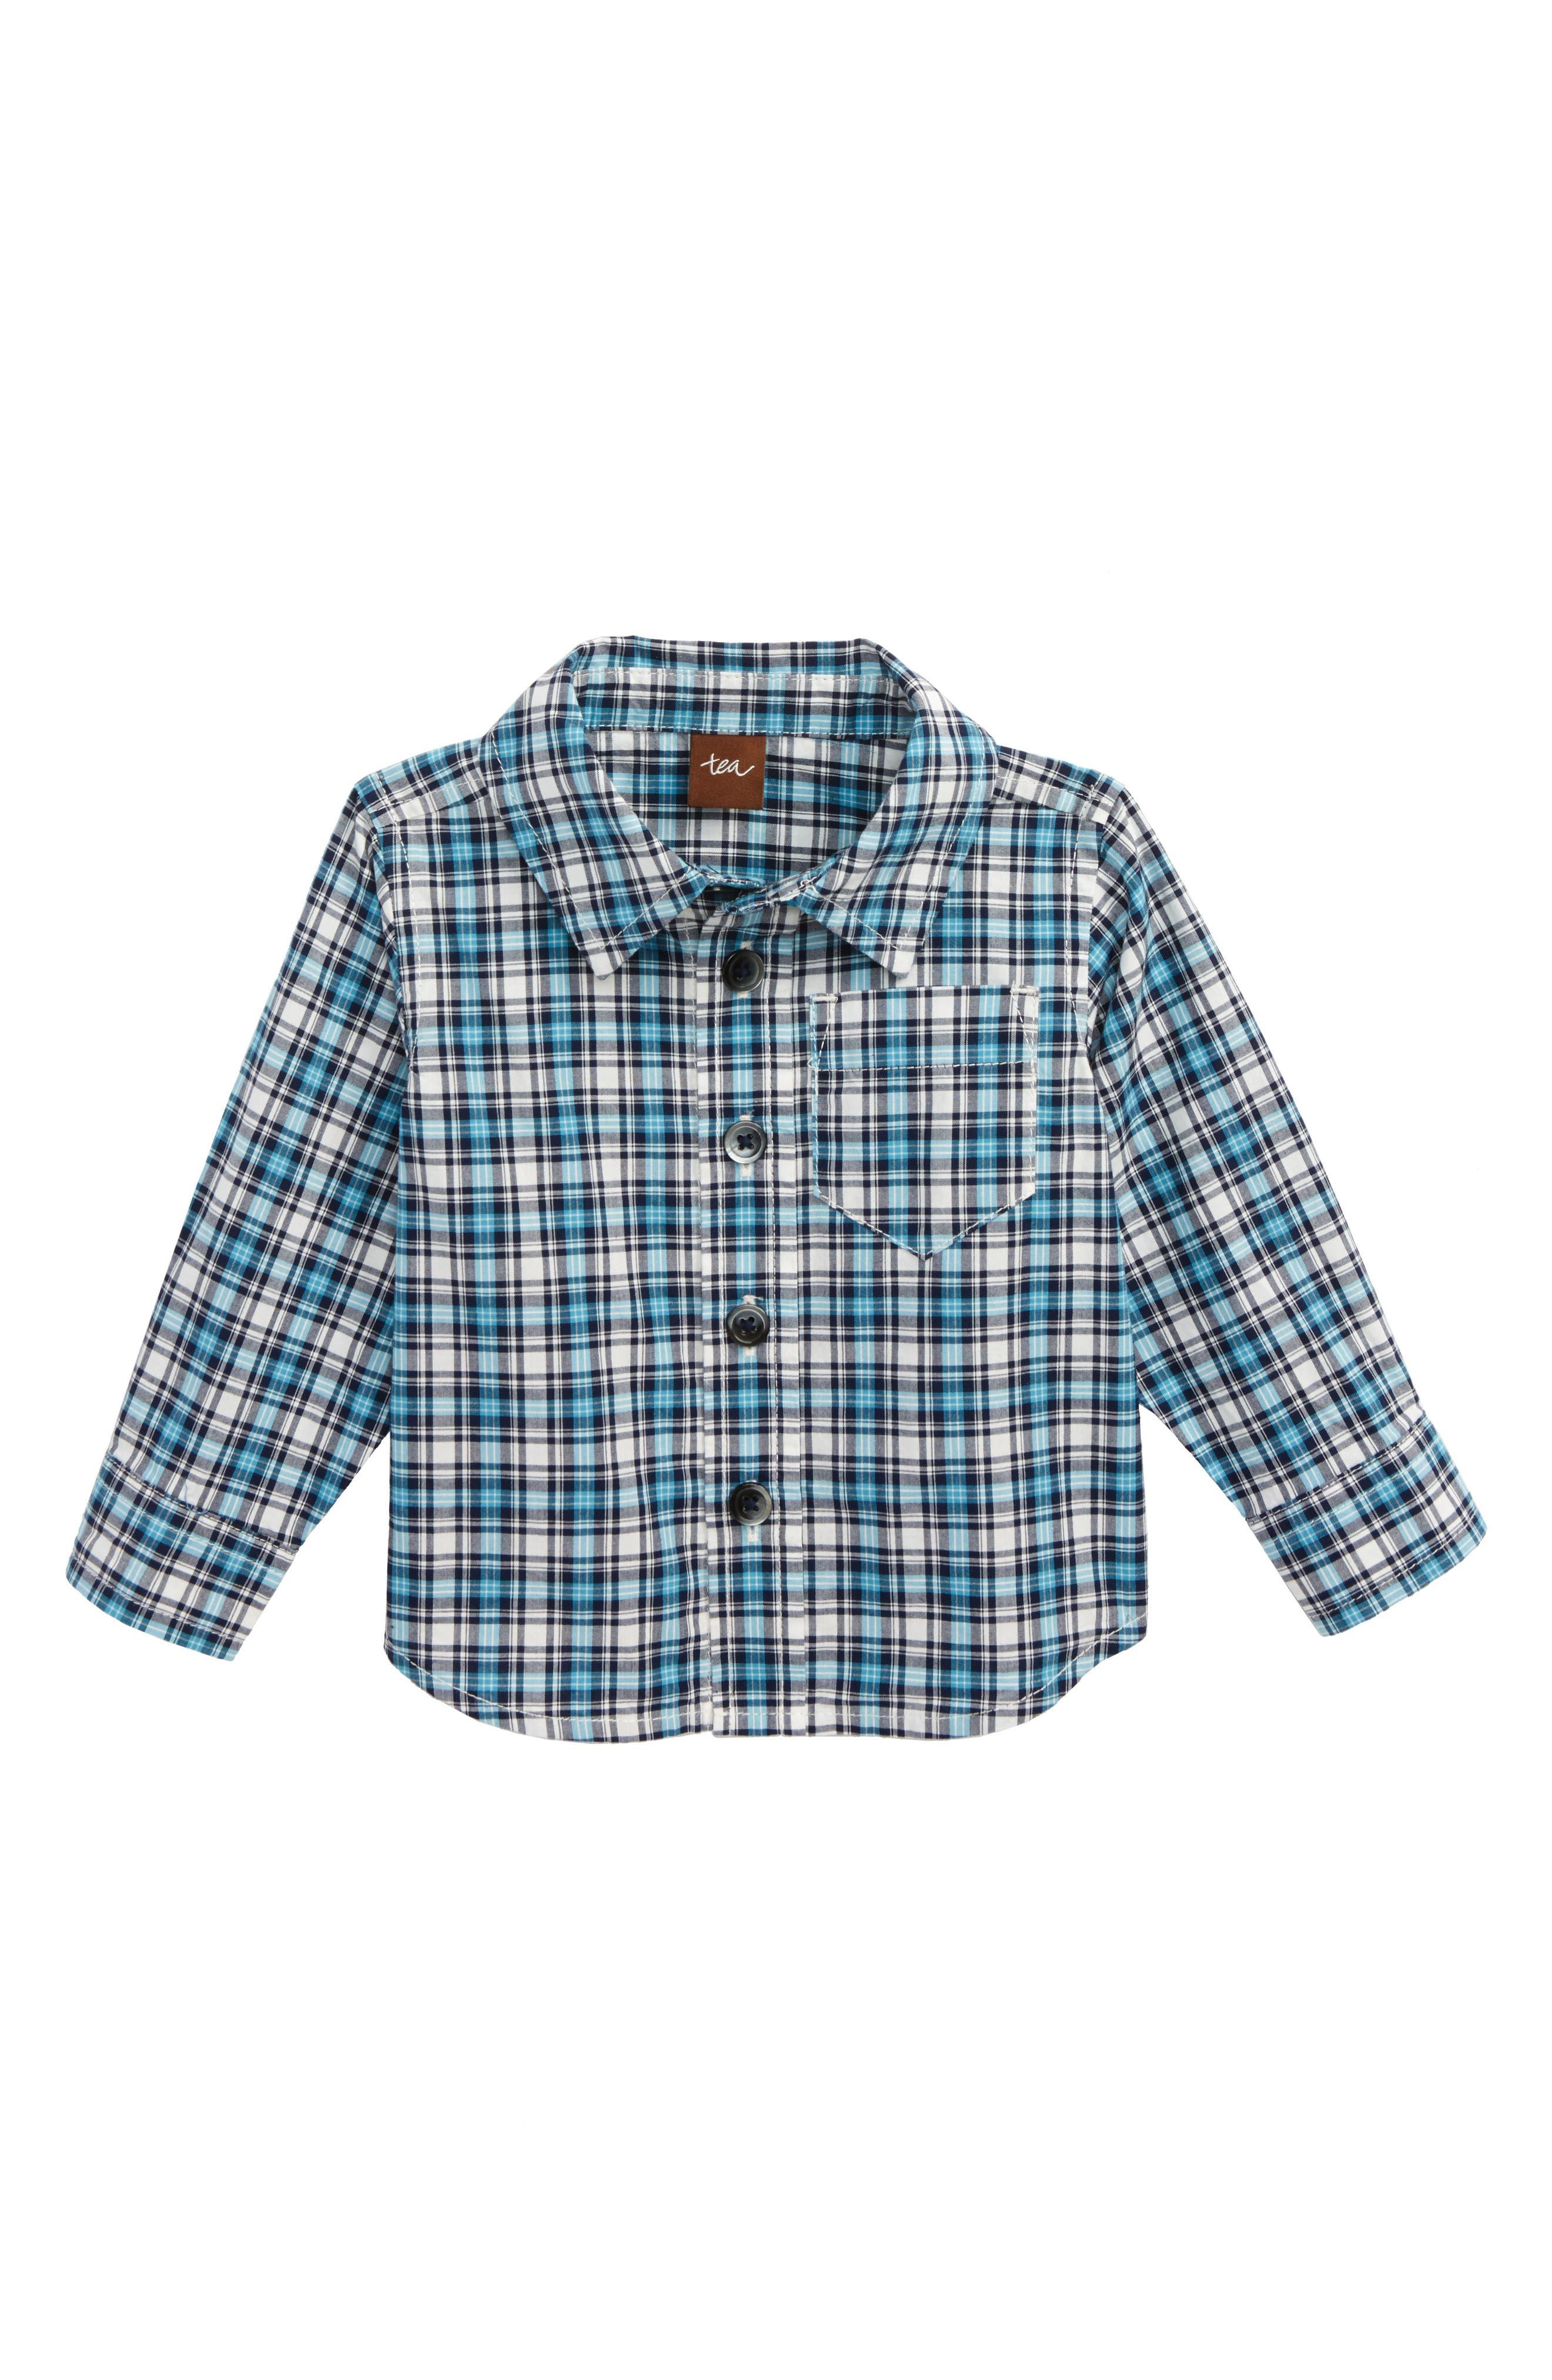 Alternate Image 1 Selected - Tea Collection Heath Plaid Woven Shirt (Baby Boys)